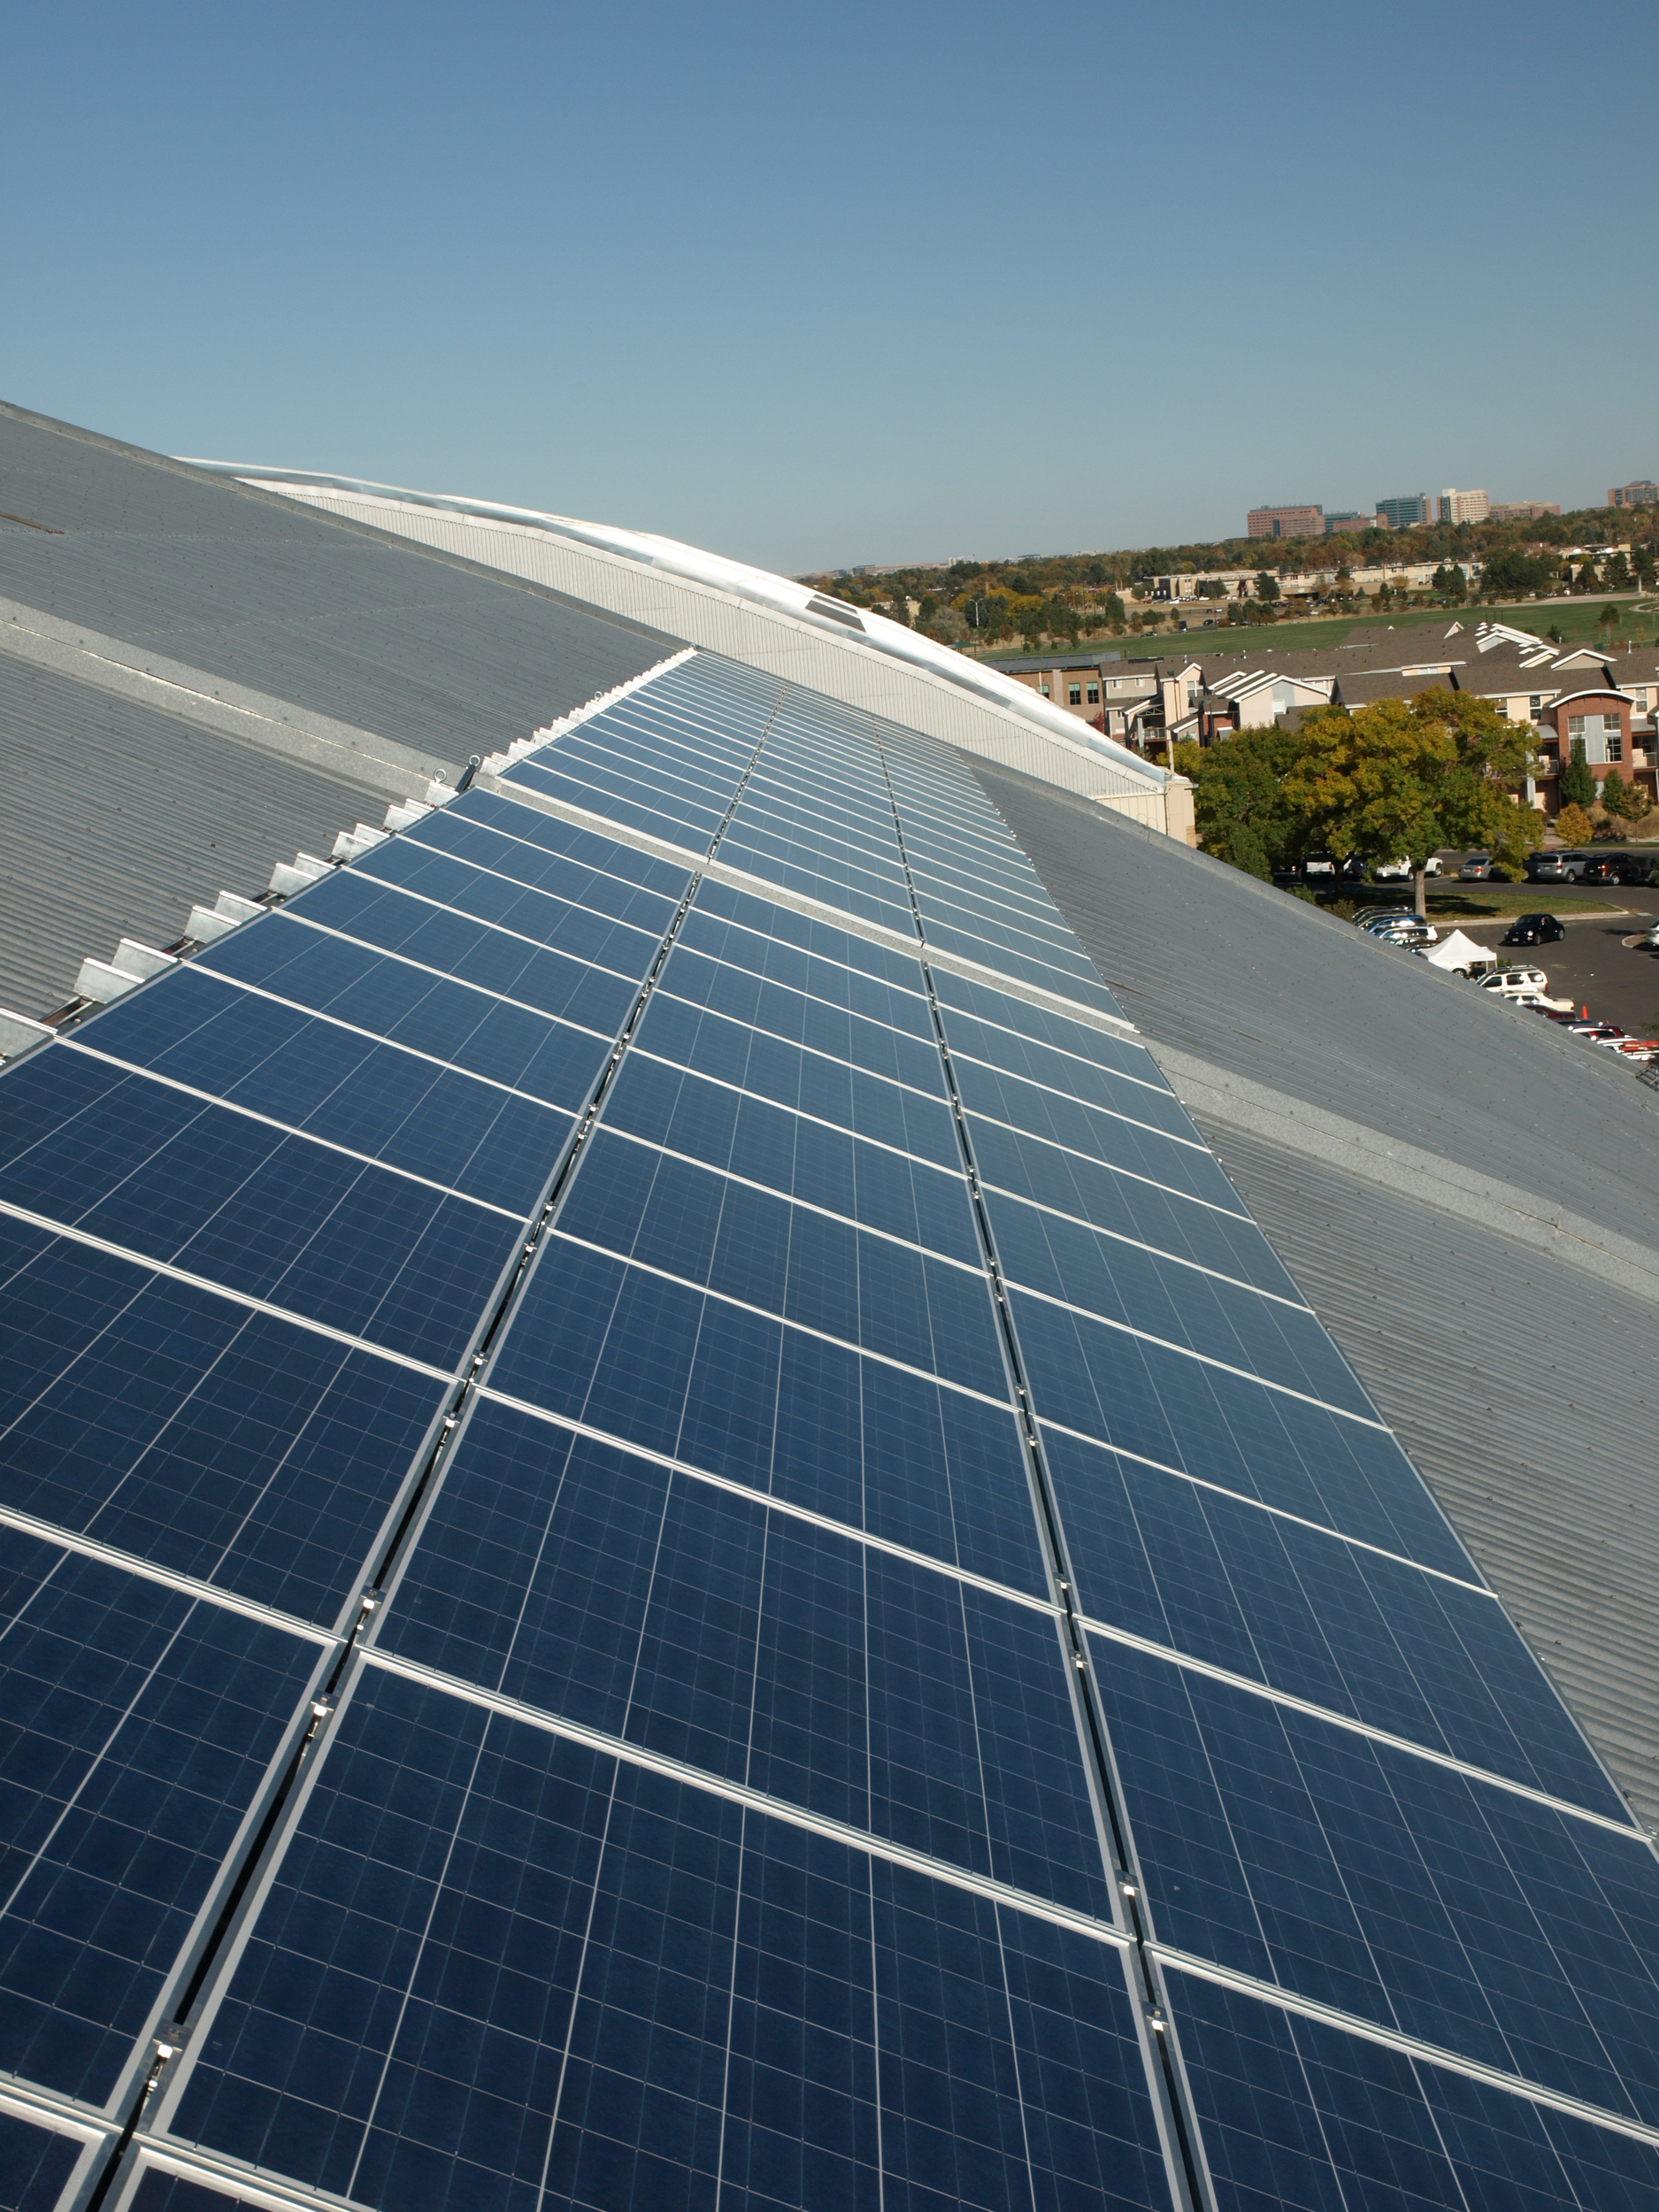 Solar panels on roof of Hangar 2